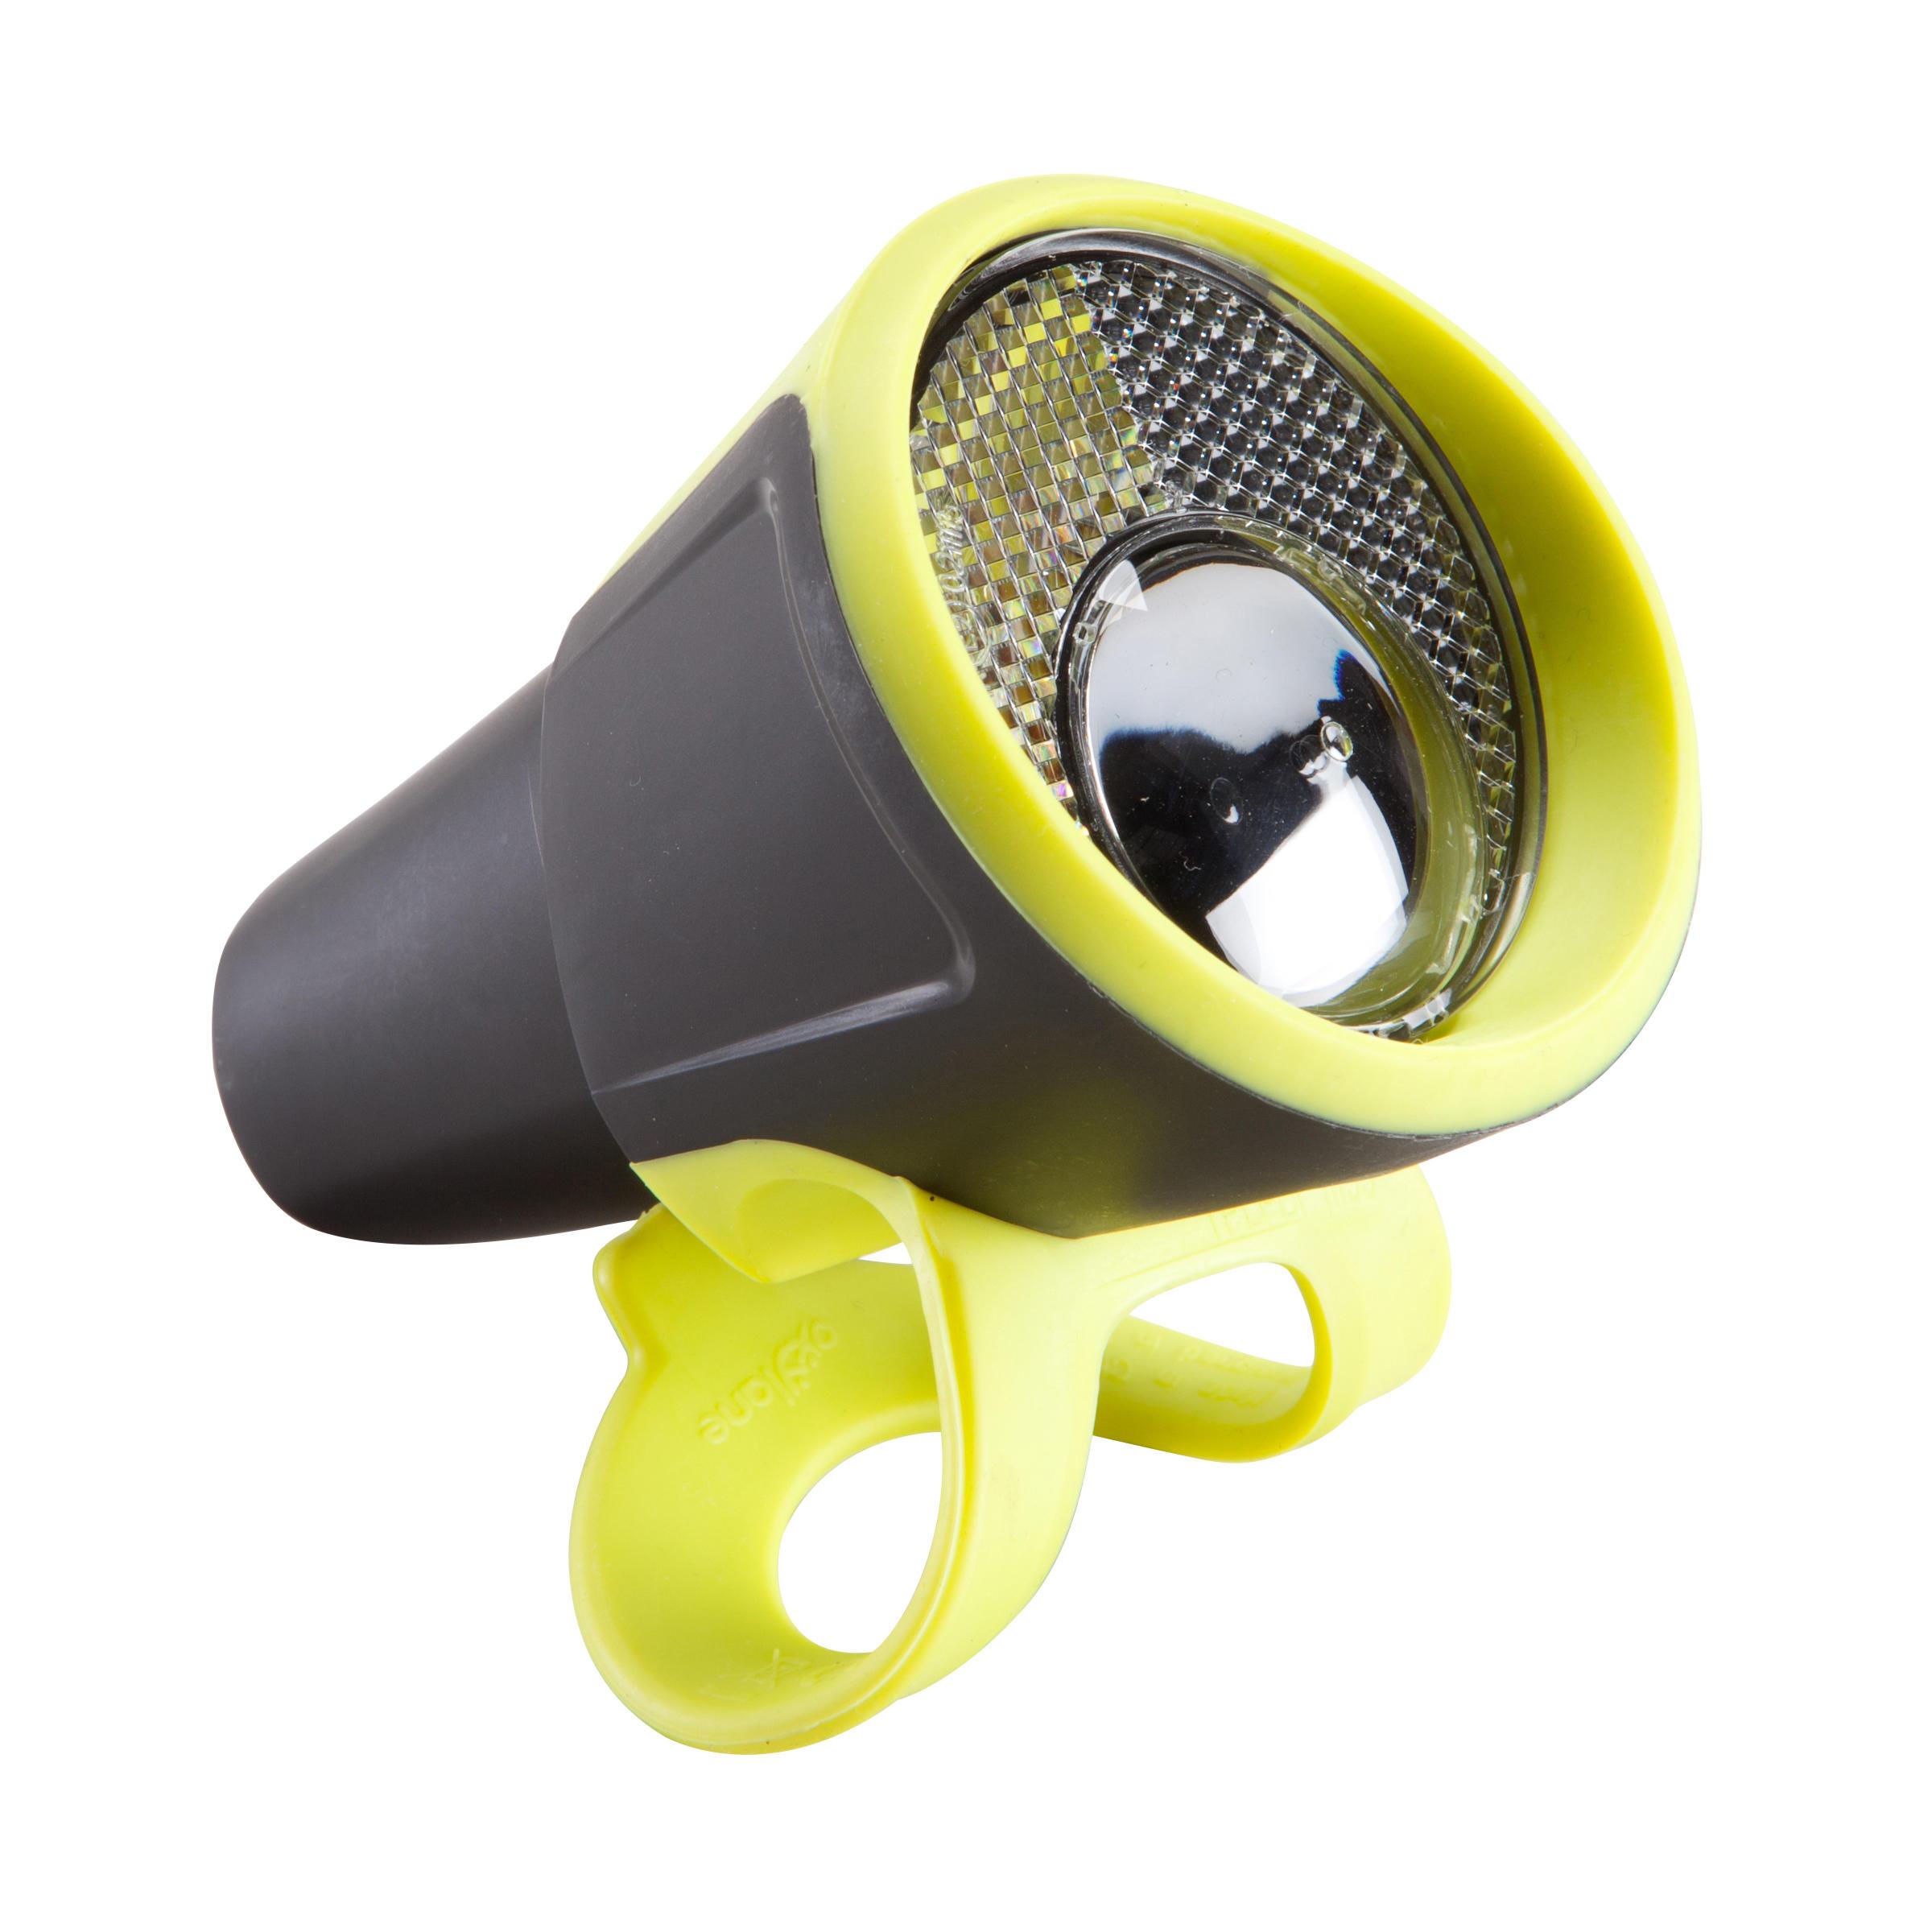 VIOO 100 Road Front/Rear LED Bike Light Set Batteries